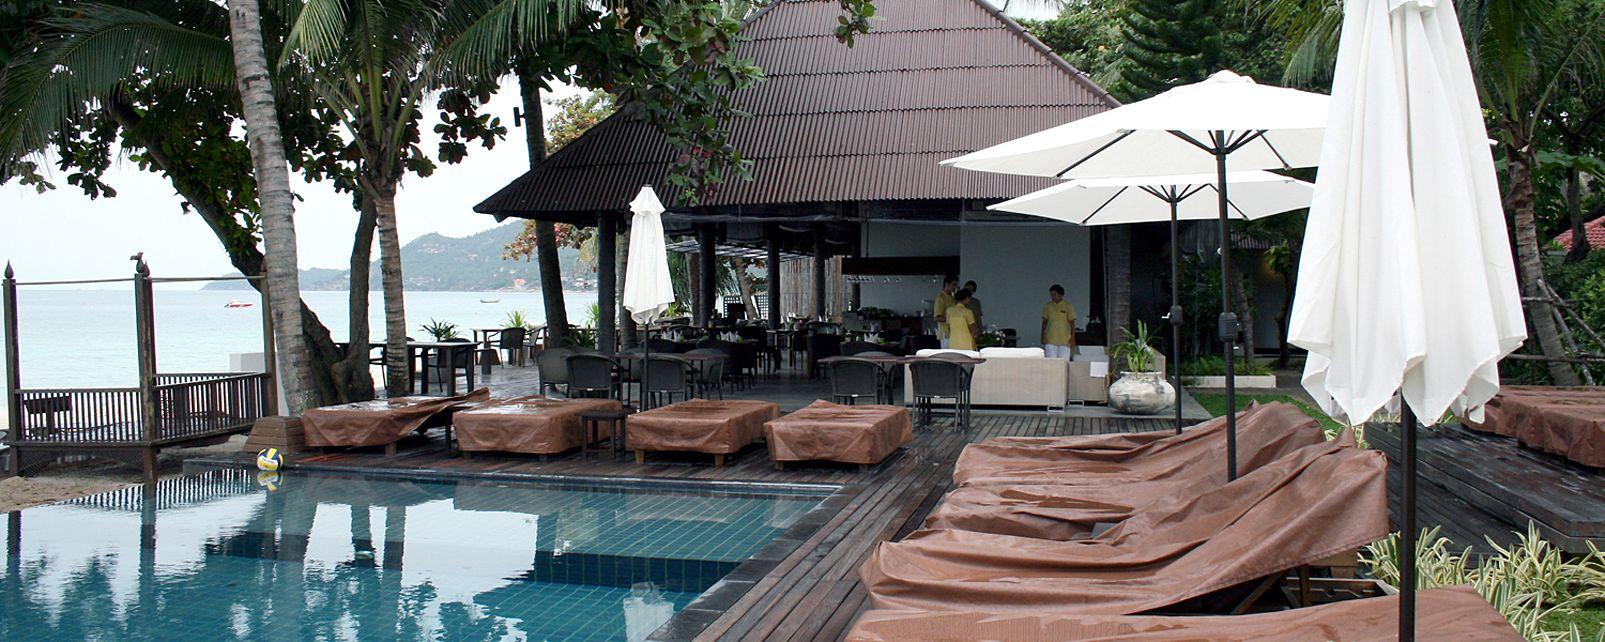 Hotel Le Paradis Boutique Resort